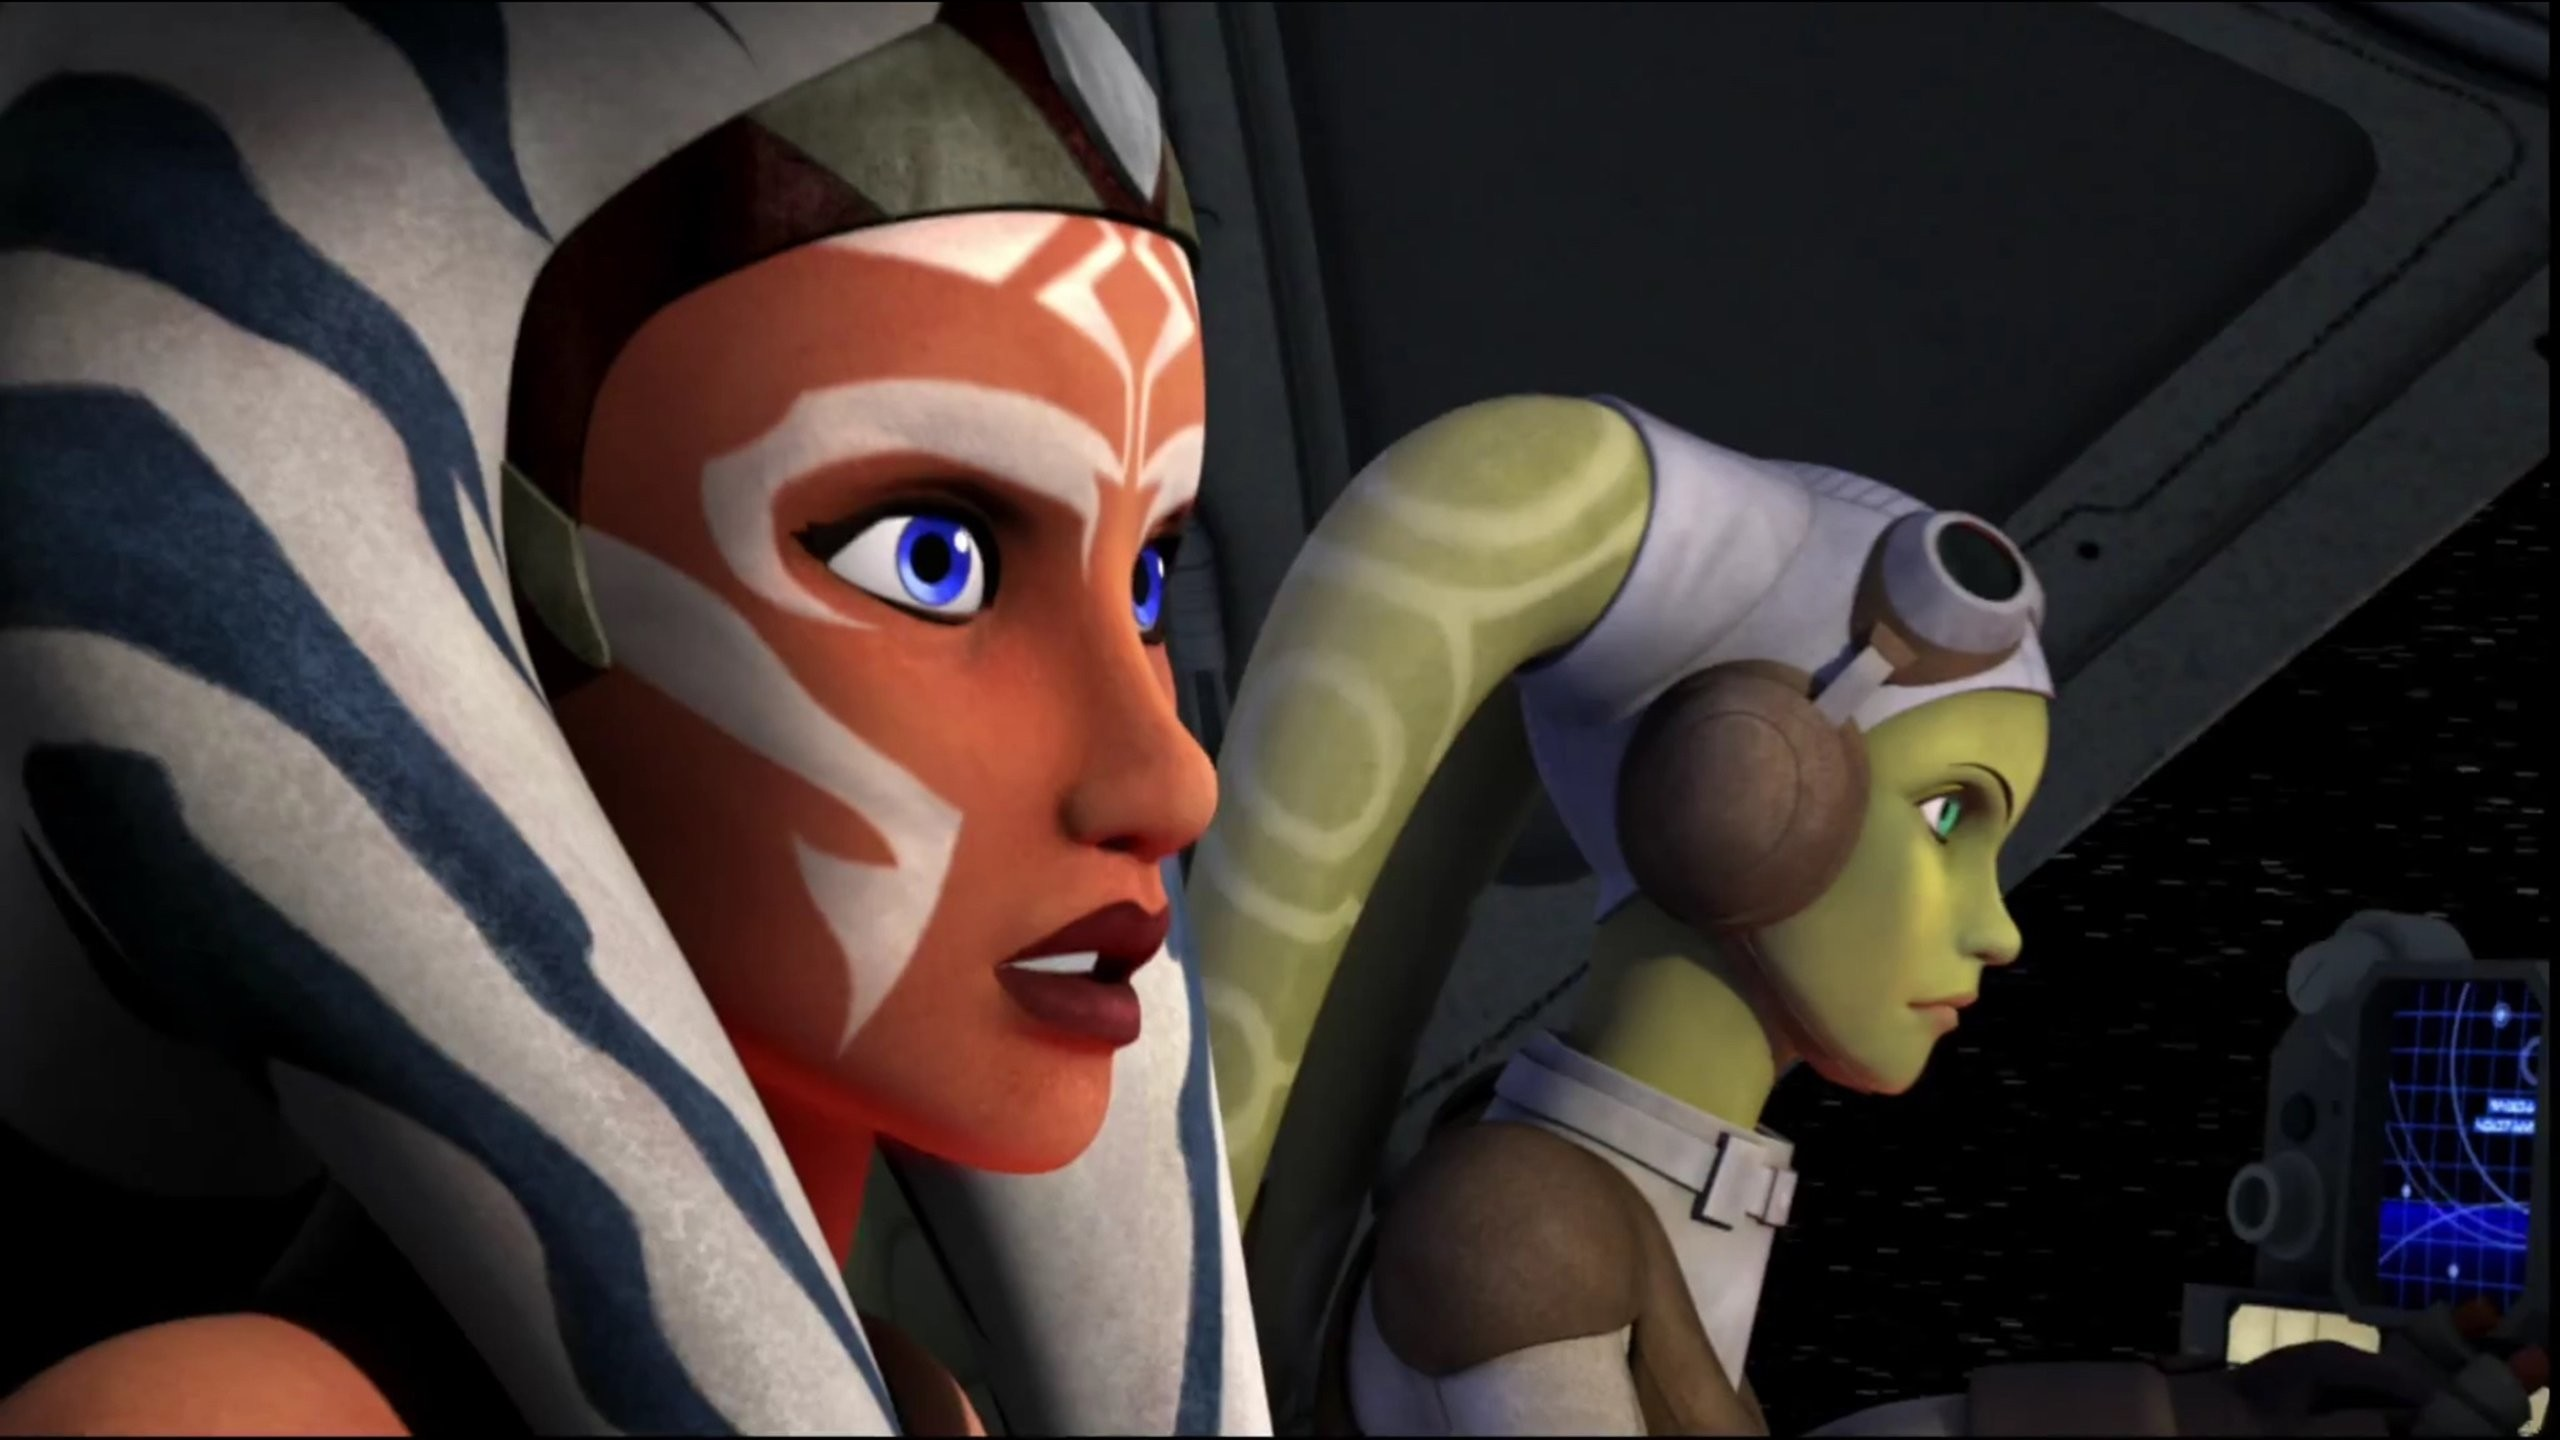 Star Wars Rebels Ahsoka and Hera wallpaper | | 667838 |  WallpaperUP